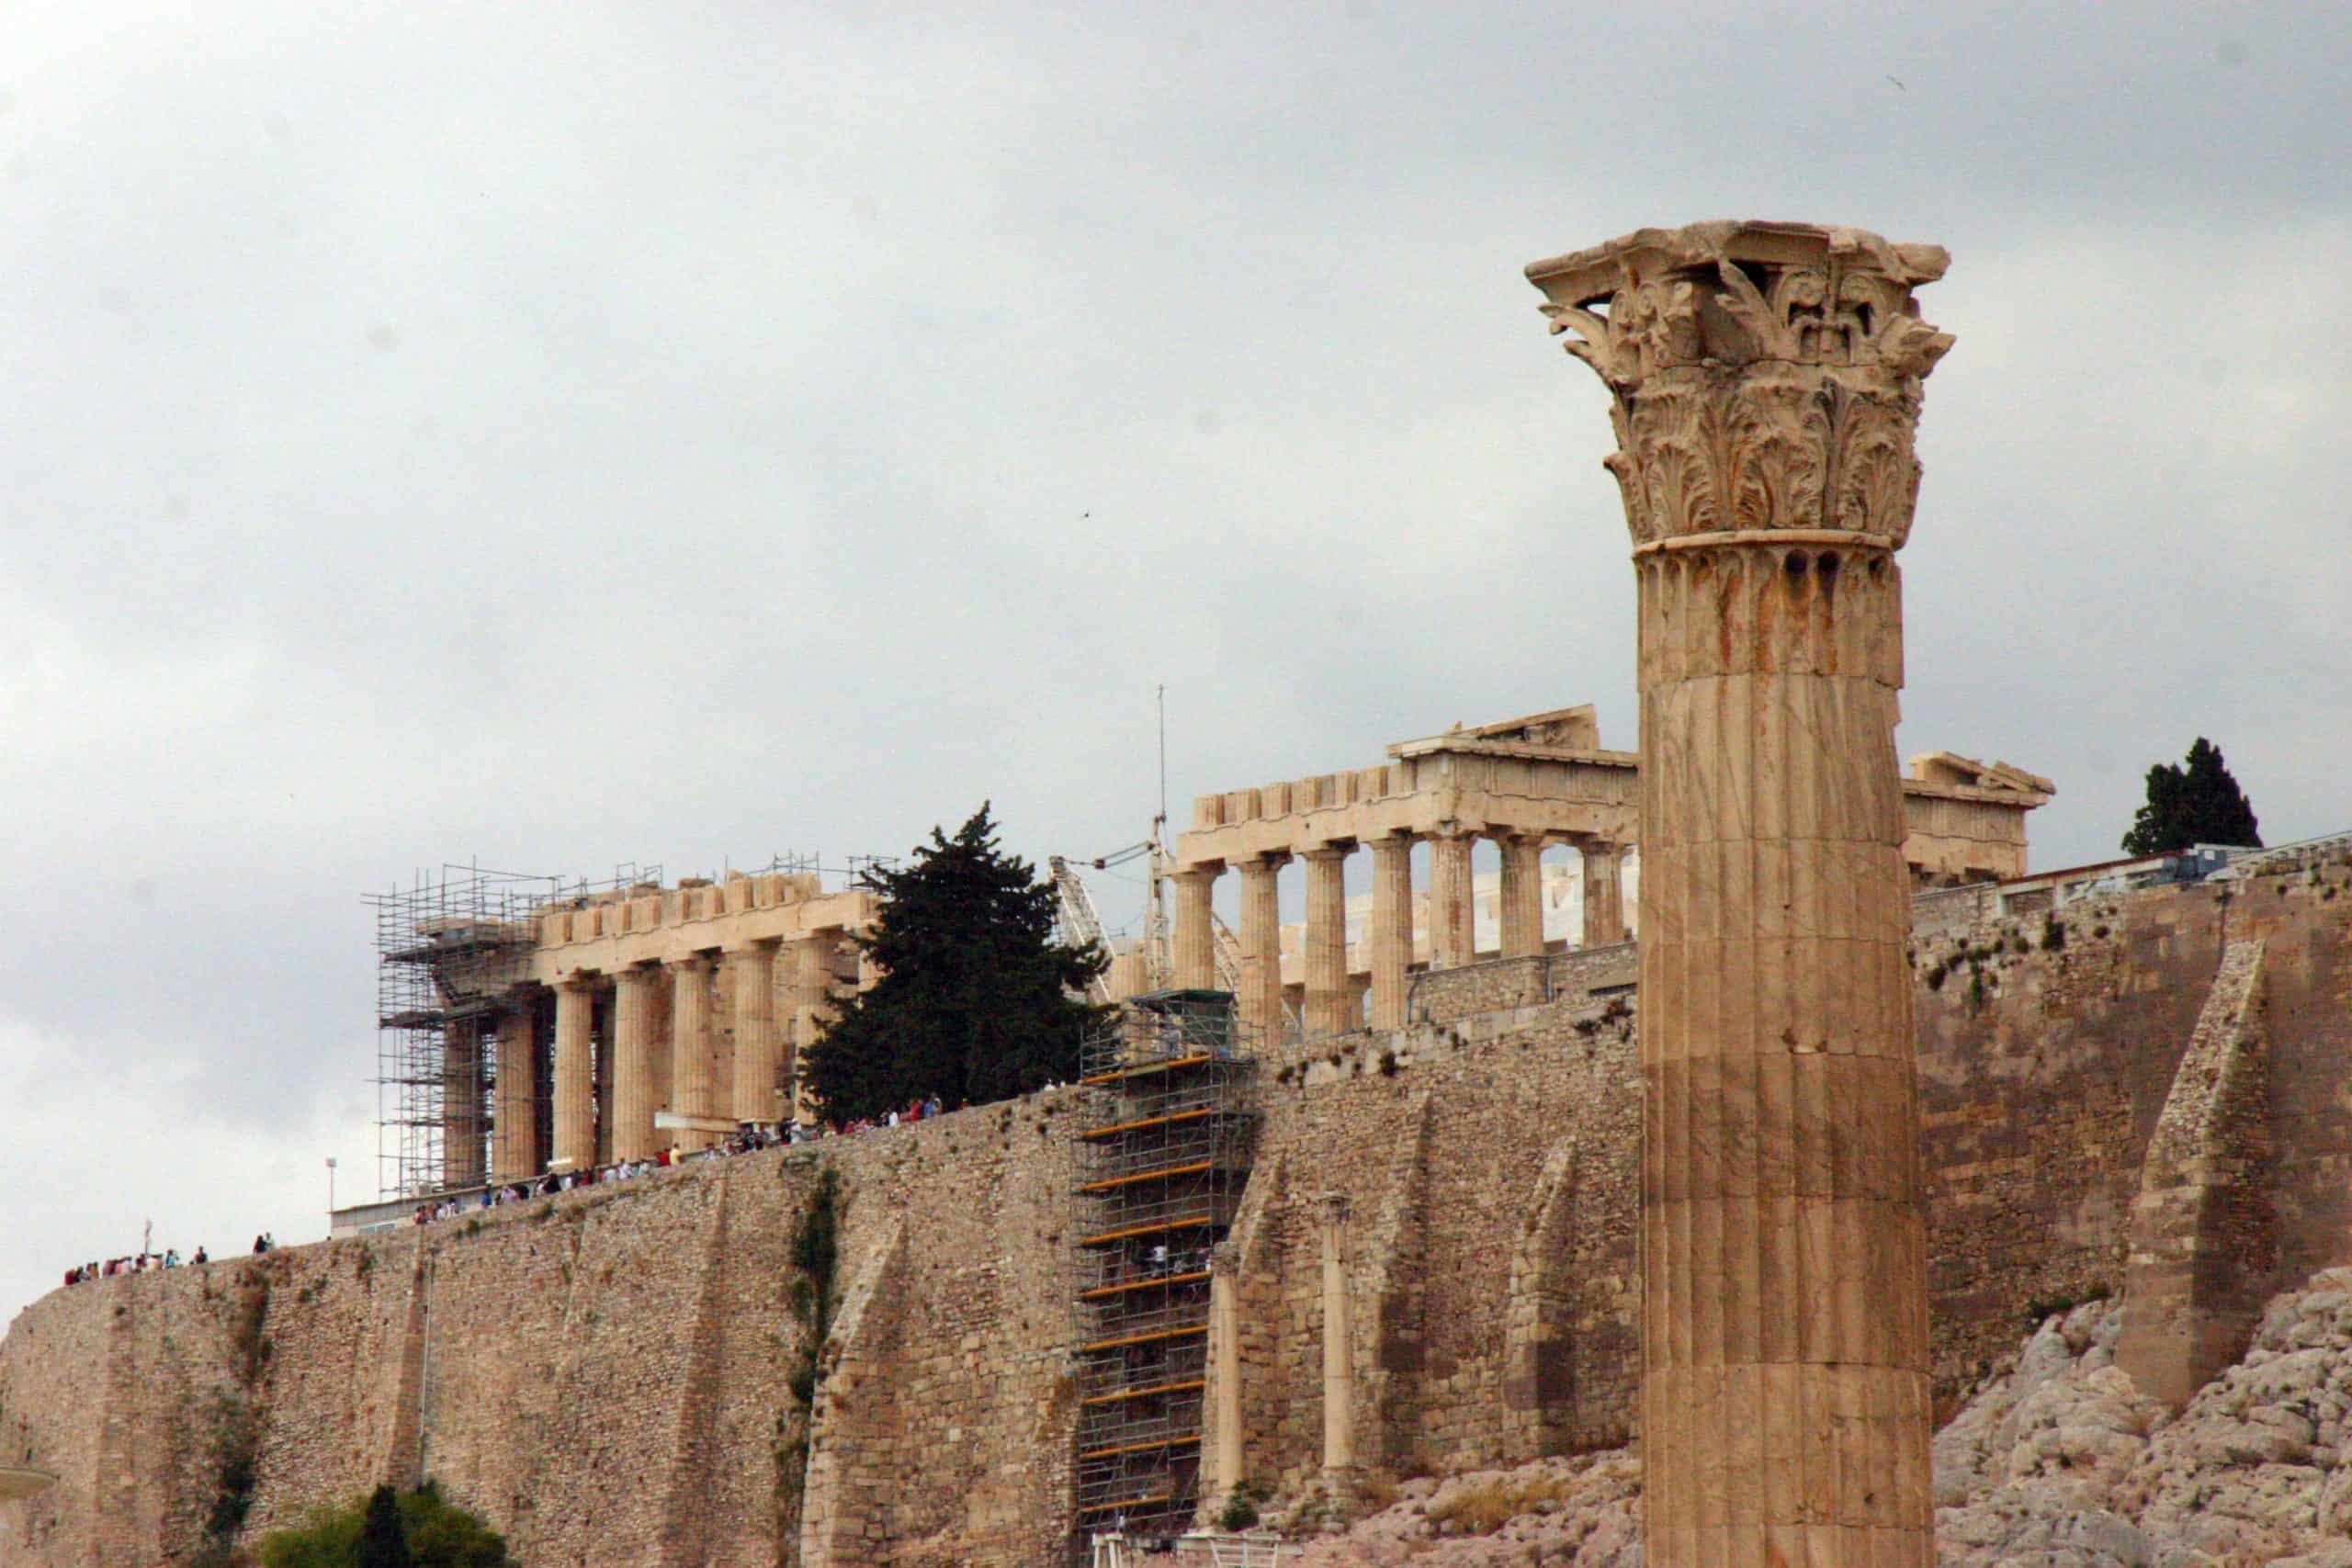 El Mensaje de Pandora - La acrópolis de Atenas